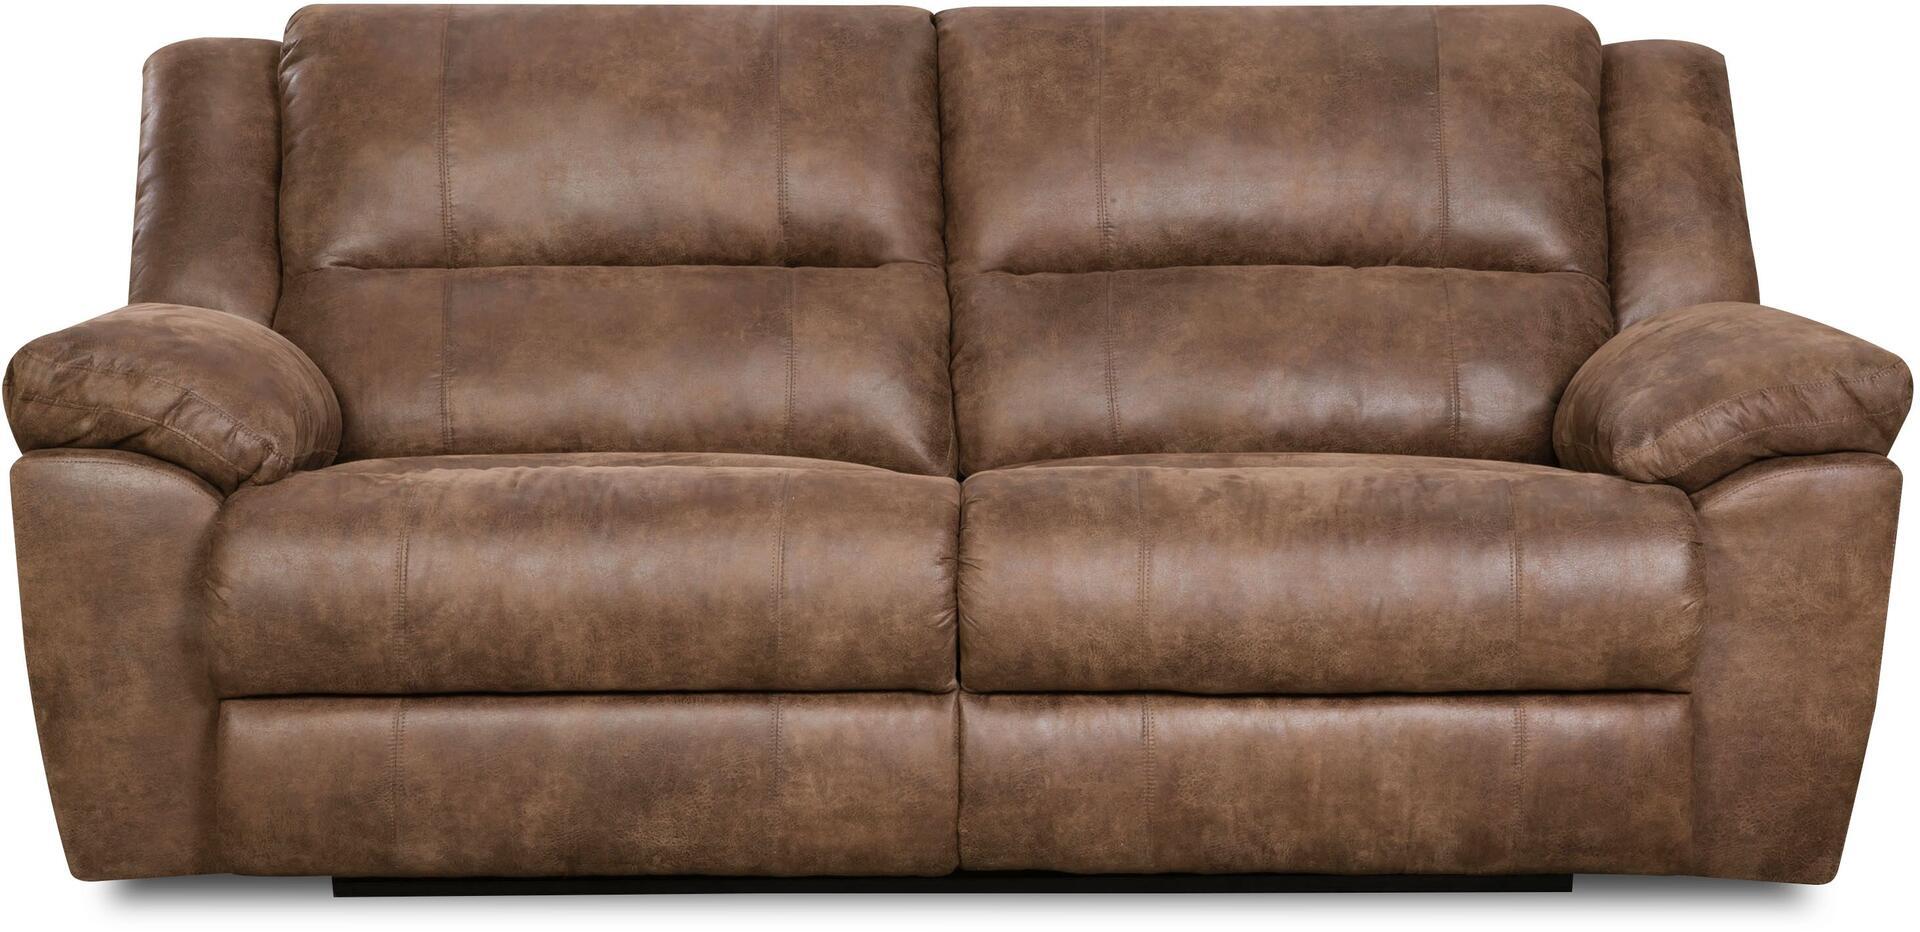 Lane Furniture Phoenix Bycast Leather Reclining Sofa ...